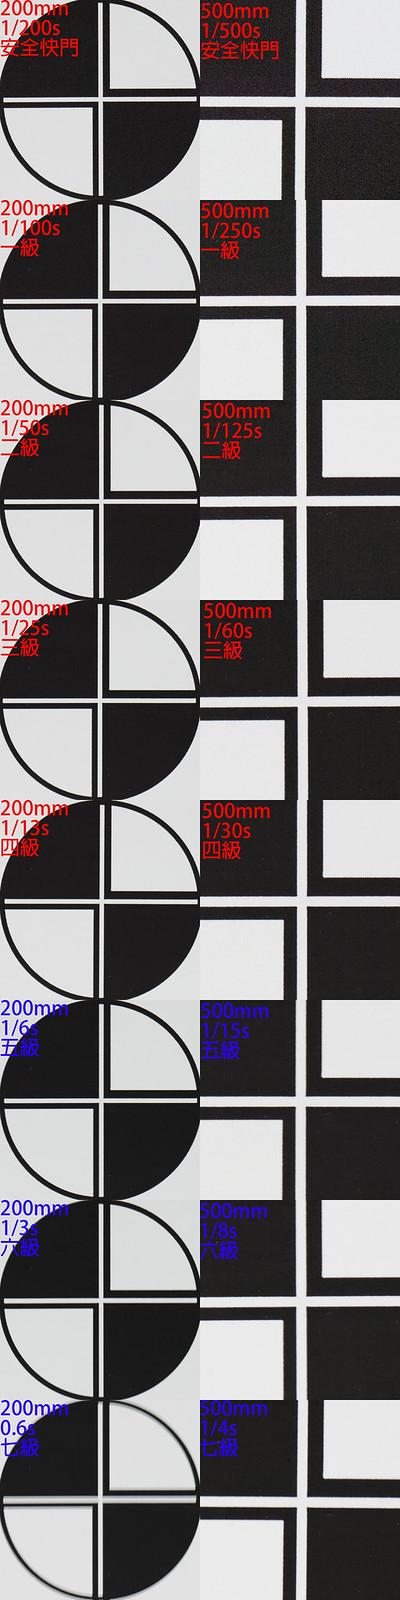 Nikon 200-500mm VR test